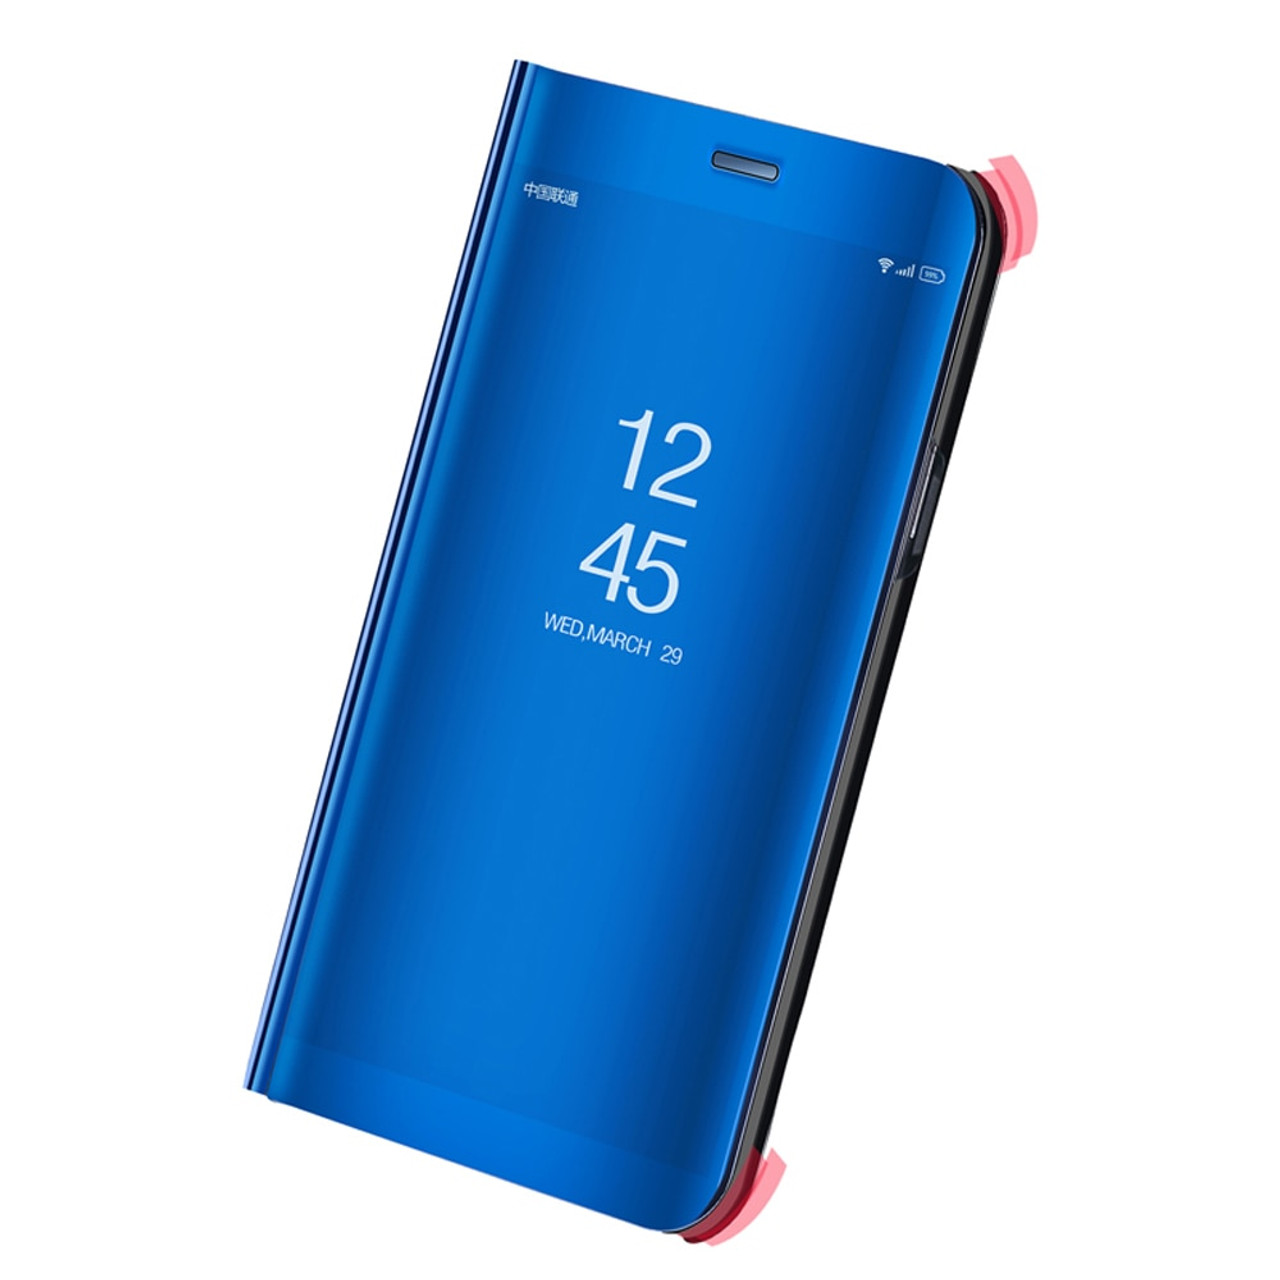 big sale 03075 44920 Dreamysow Mirror Flip Case For Xiaomi Redmi 5 5 Plus Note 4 4X 5A Pro 32GB  64GB Clear View Phone Stand Cover For Xiaomi Mi A1 5X